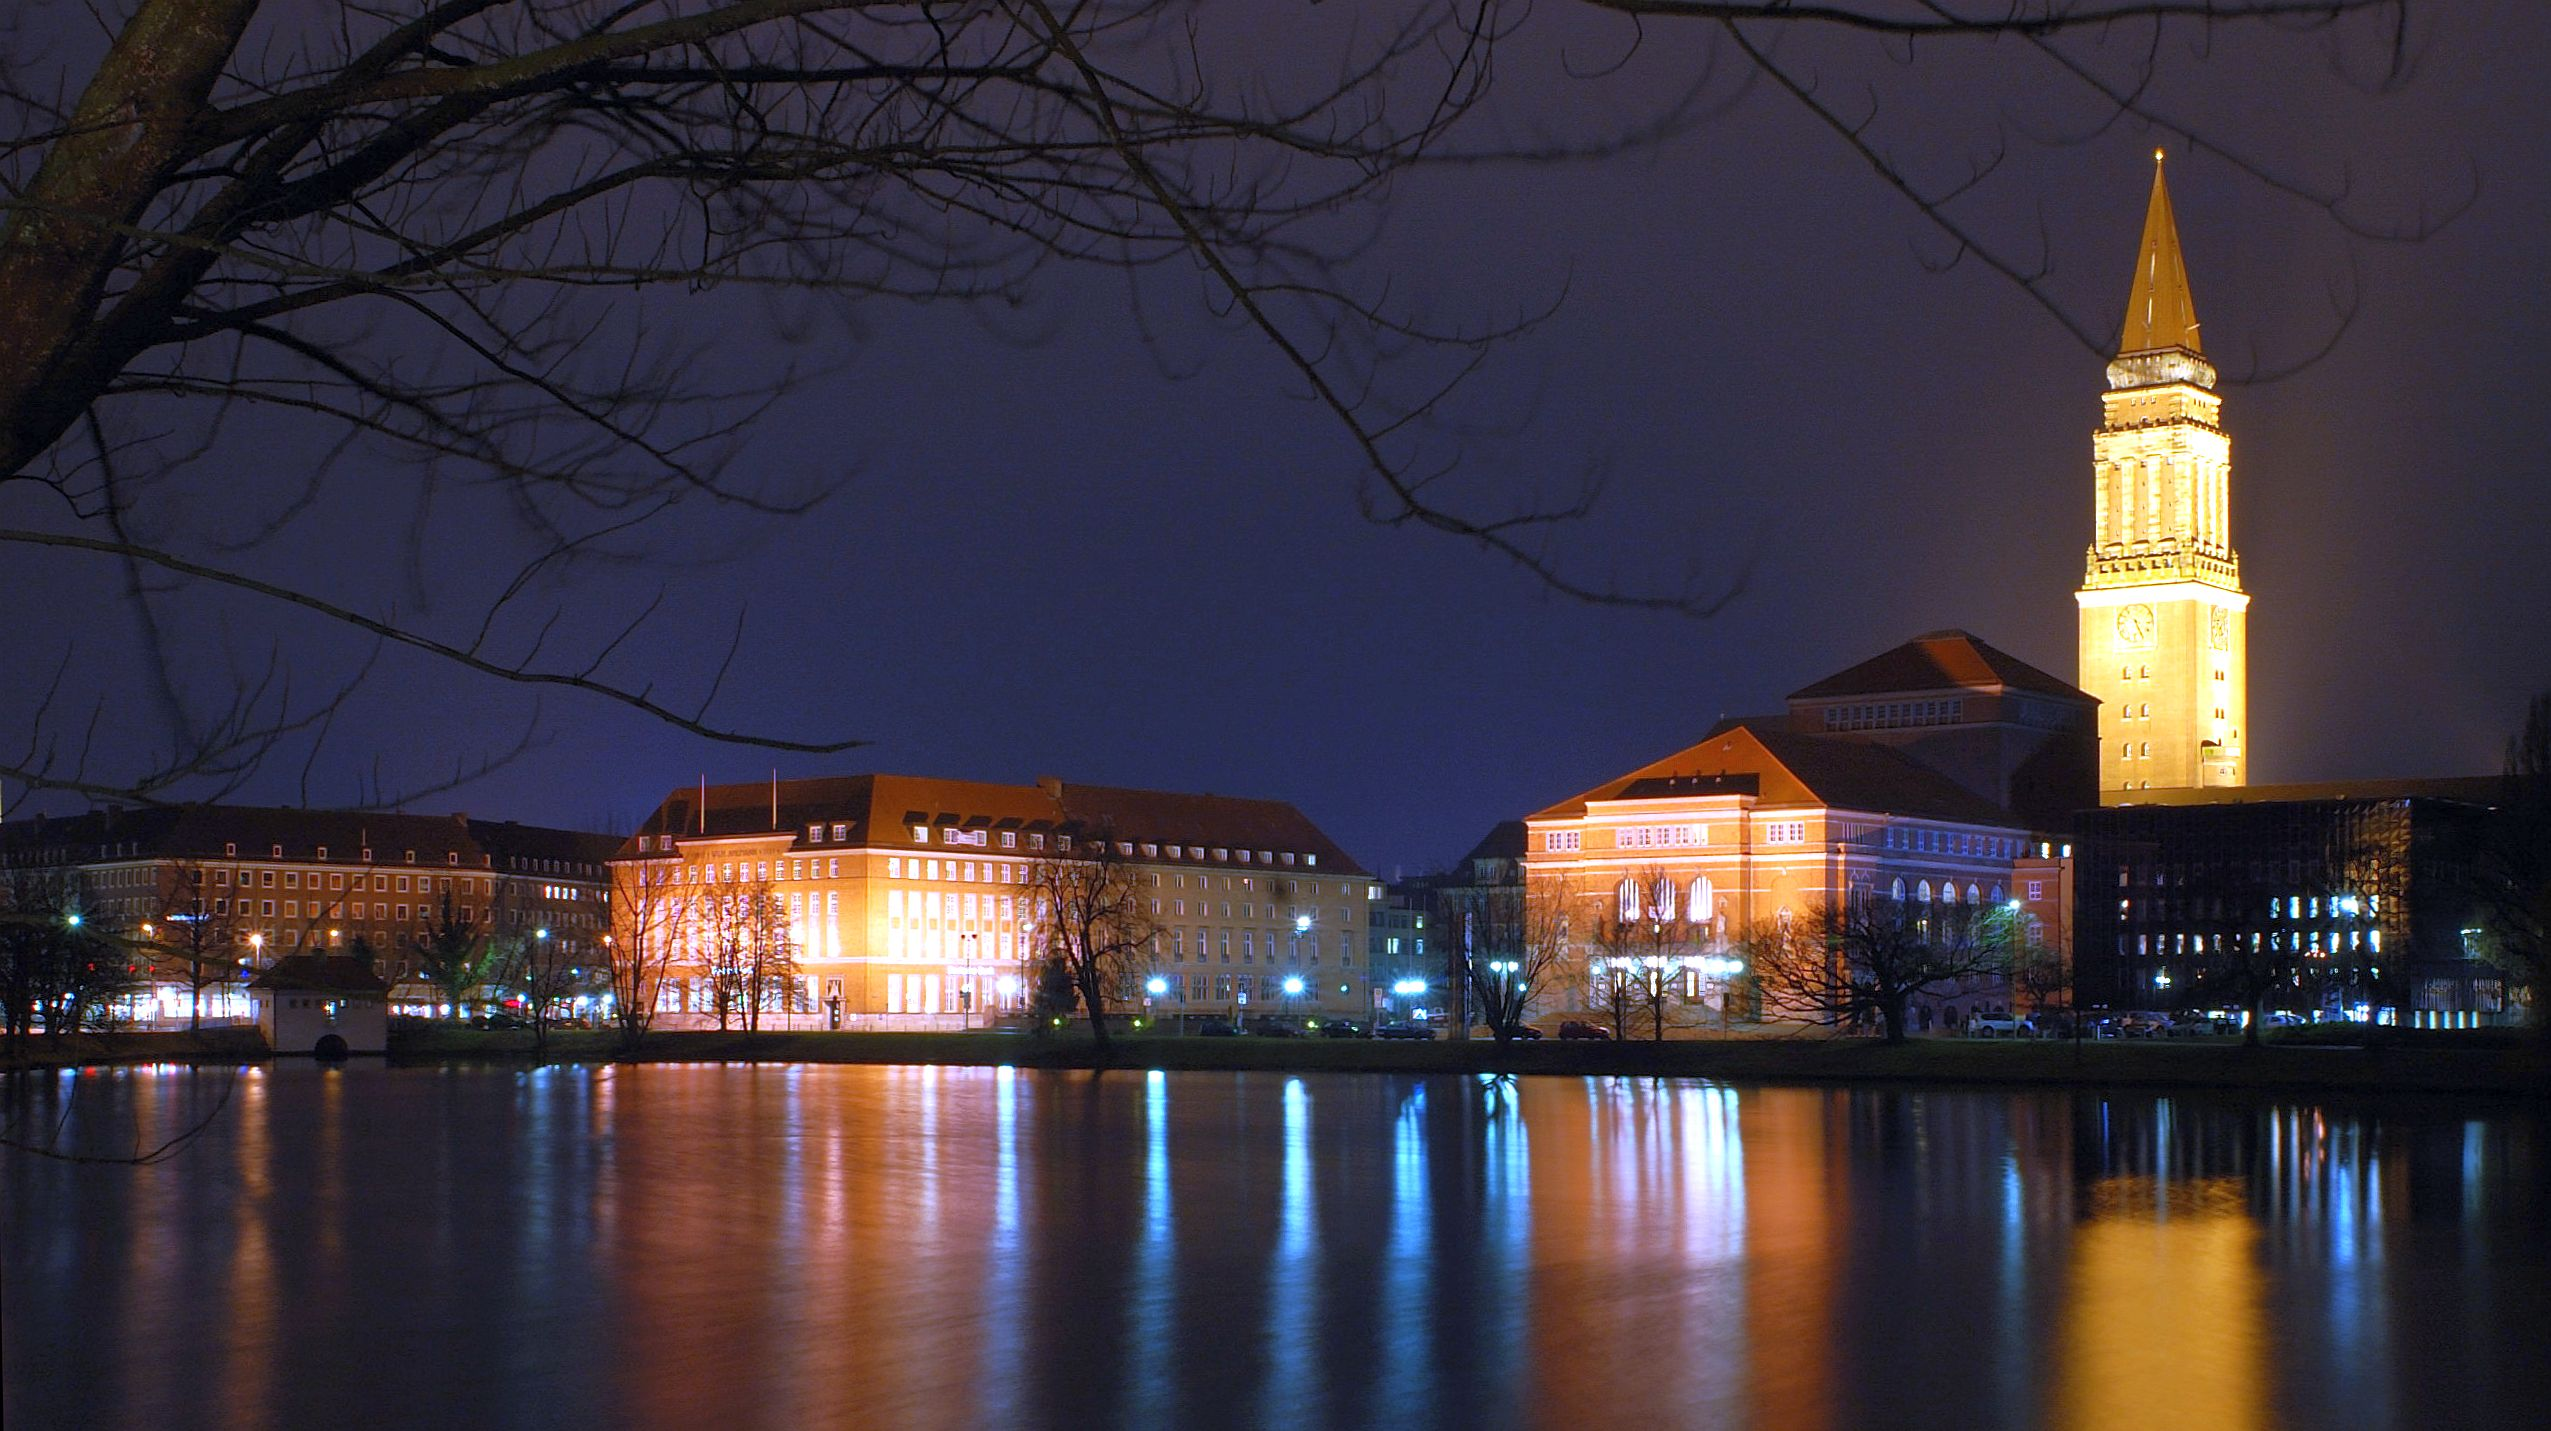 Kiel_Rathaus_0336